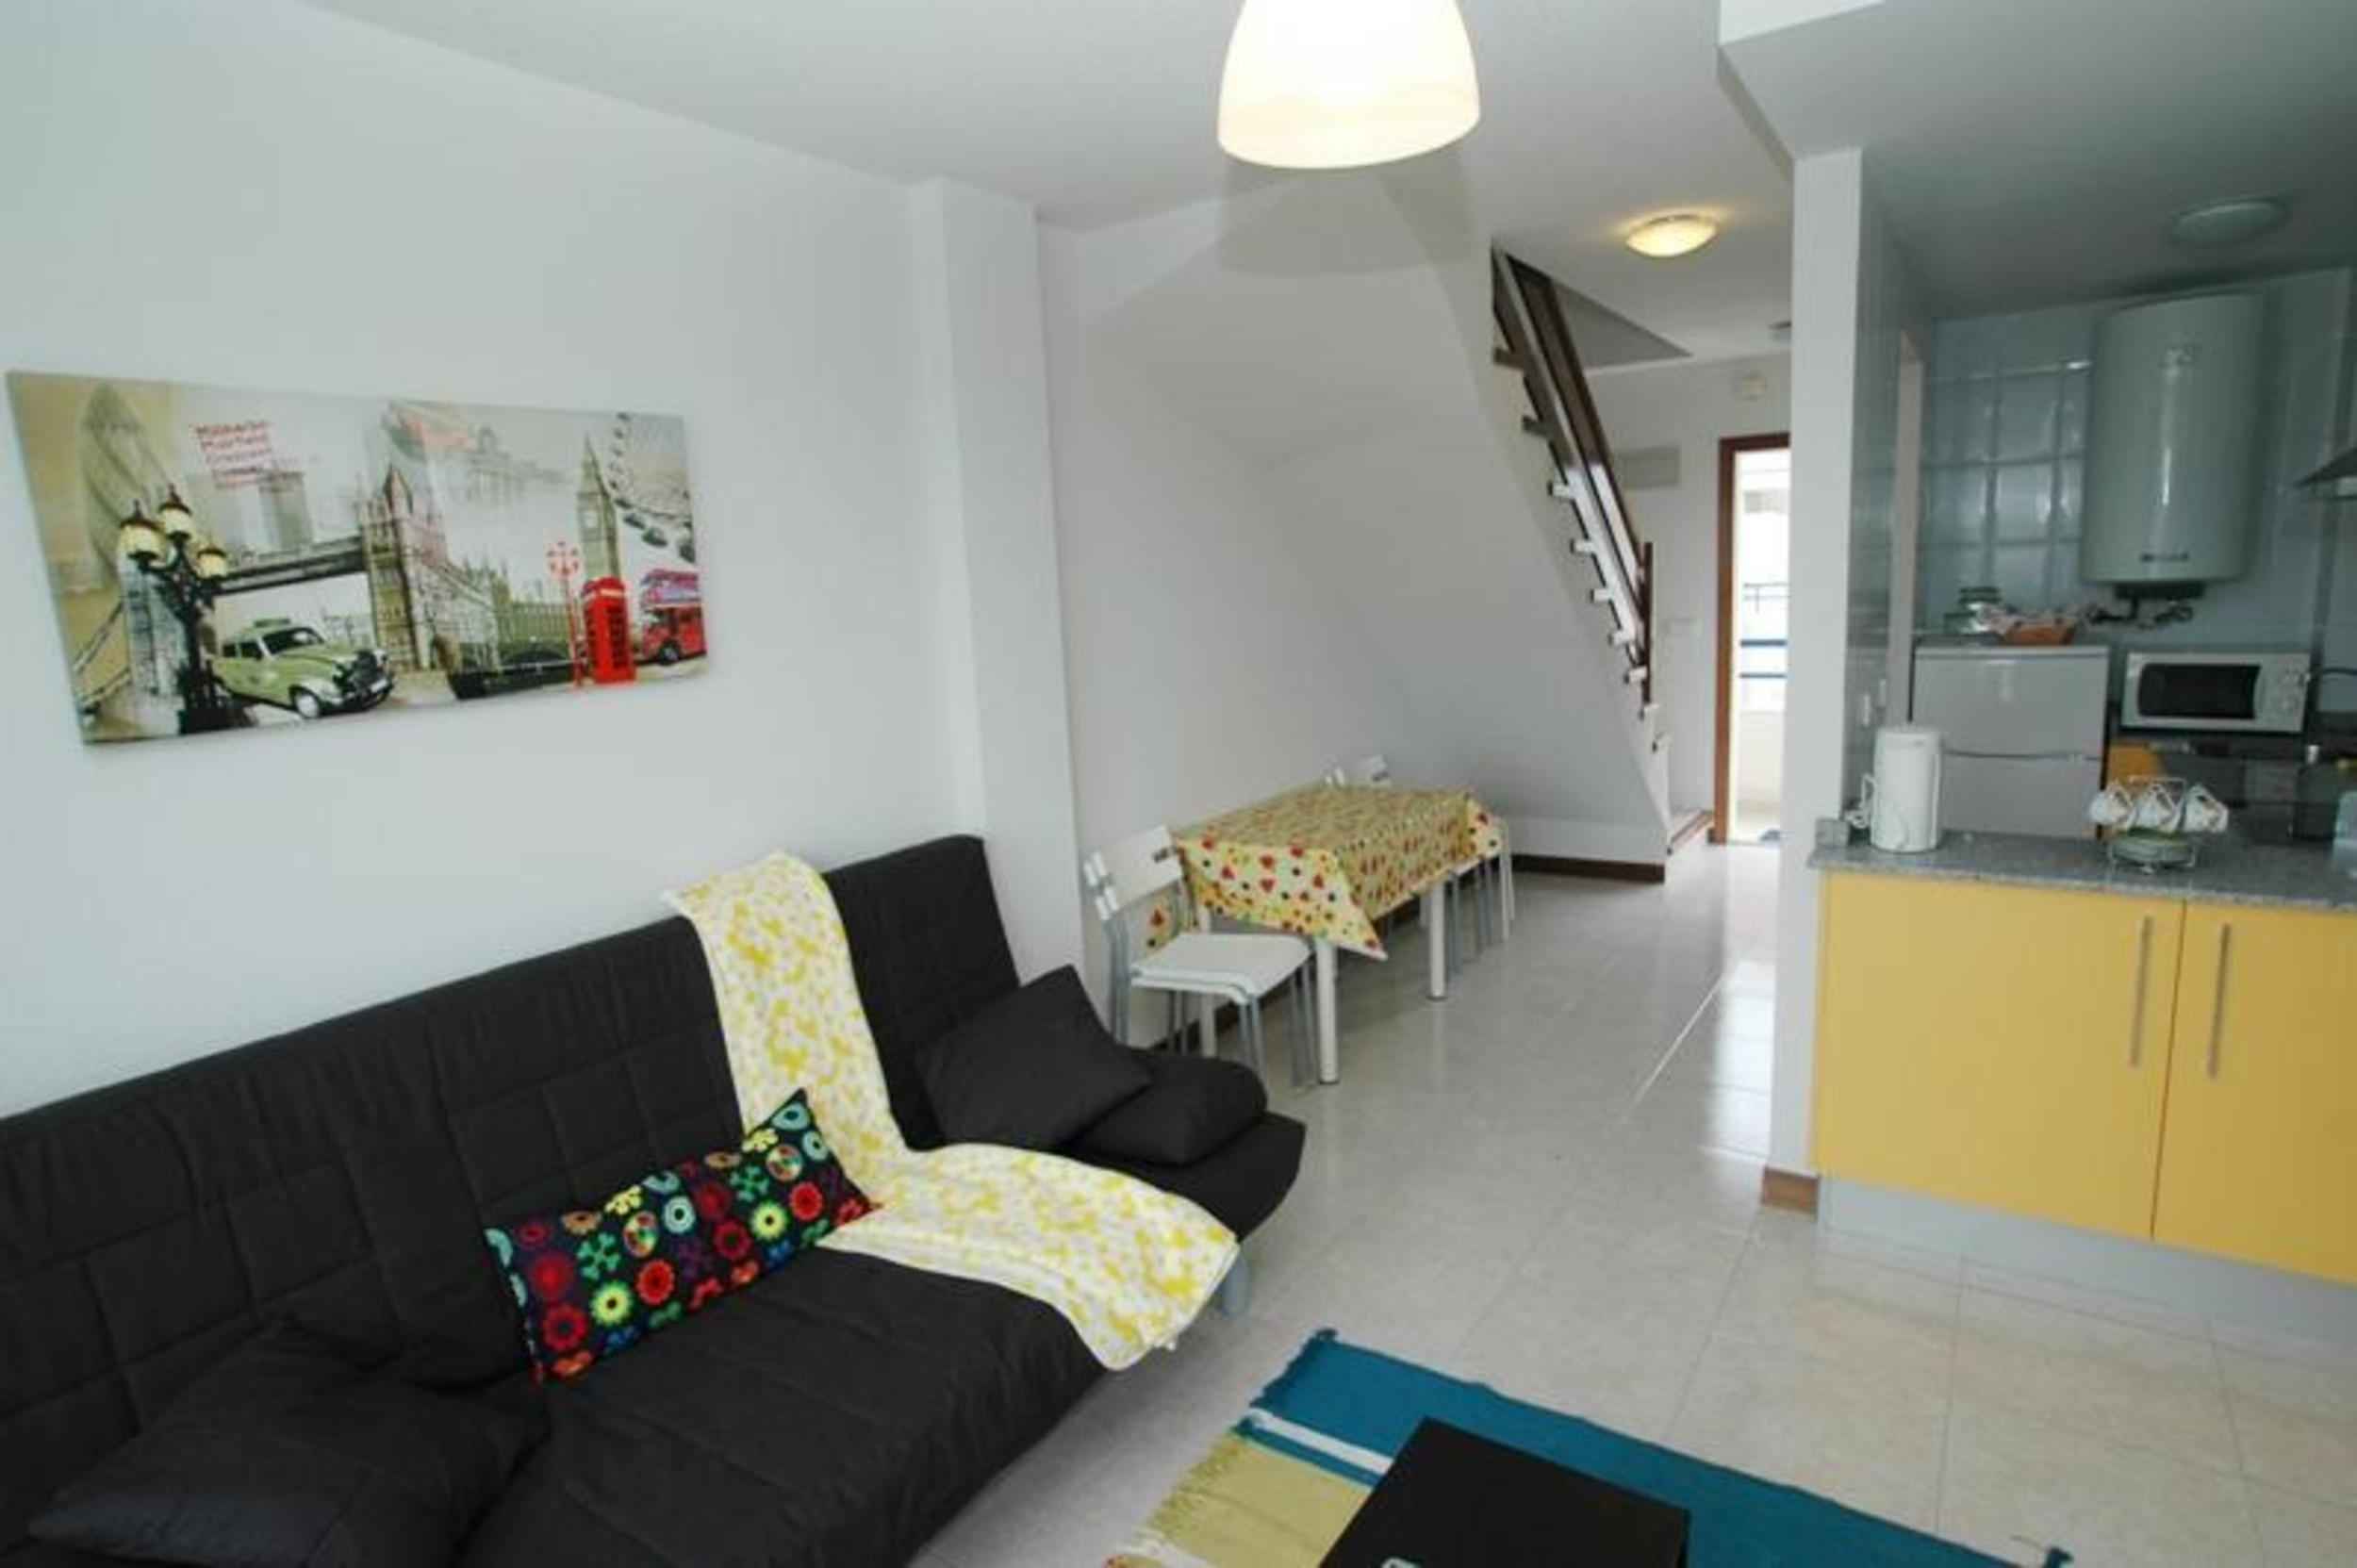 Ferienwohnung Apartment - 2 Bedrooms with Pool and Sea views - 102775 (2360880), Isla, Costa de Cantabria, Kantabrien, Spanien, Bild 12